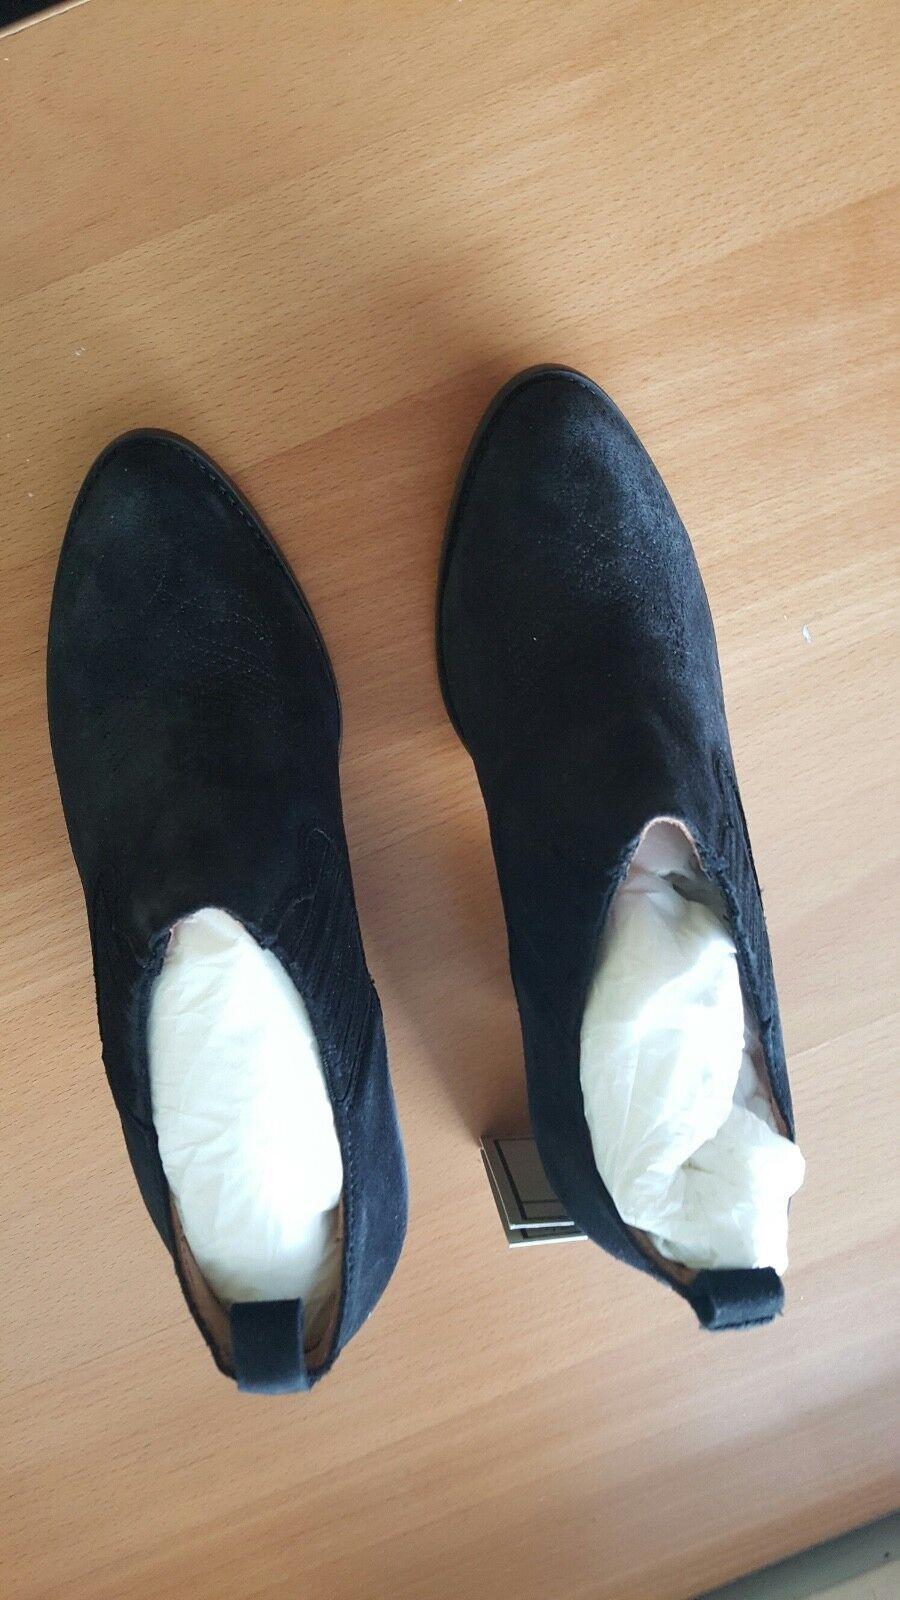 Frye Jane Stitch piel 77230 14L Rojowood piel Stitch grabada rodilla botas altas mujer 5.5 82080f